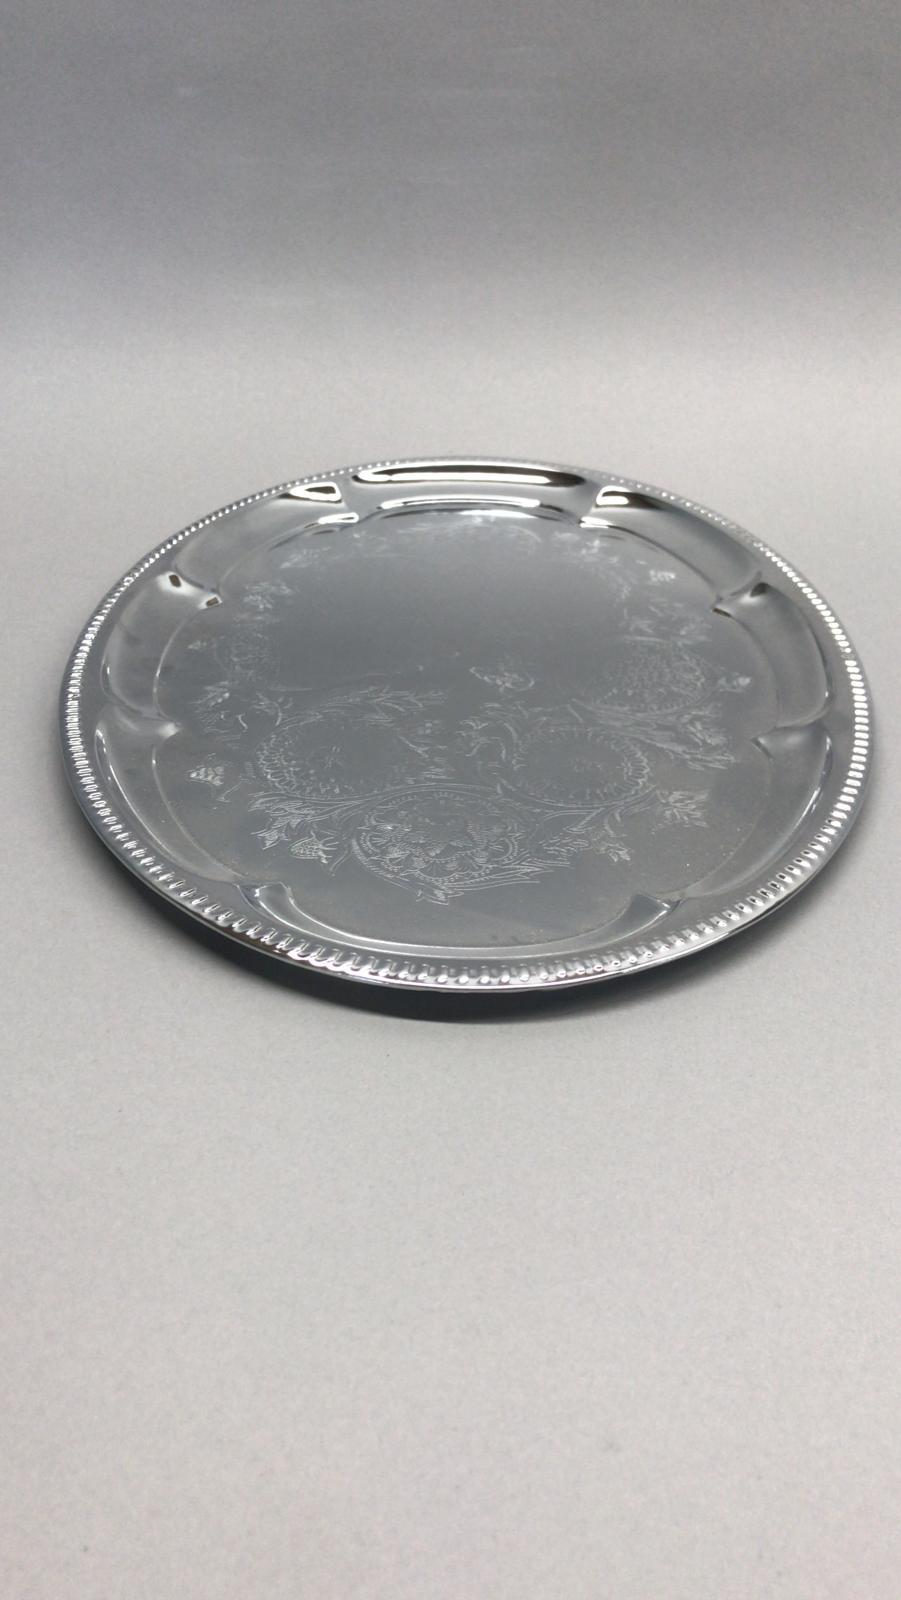 Ovāla sudraba paplāte Овальный серебряный поднос Oval silver tray